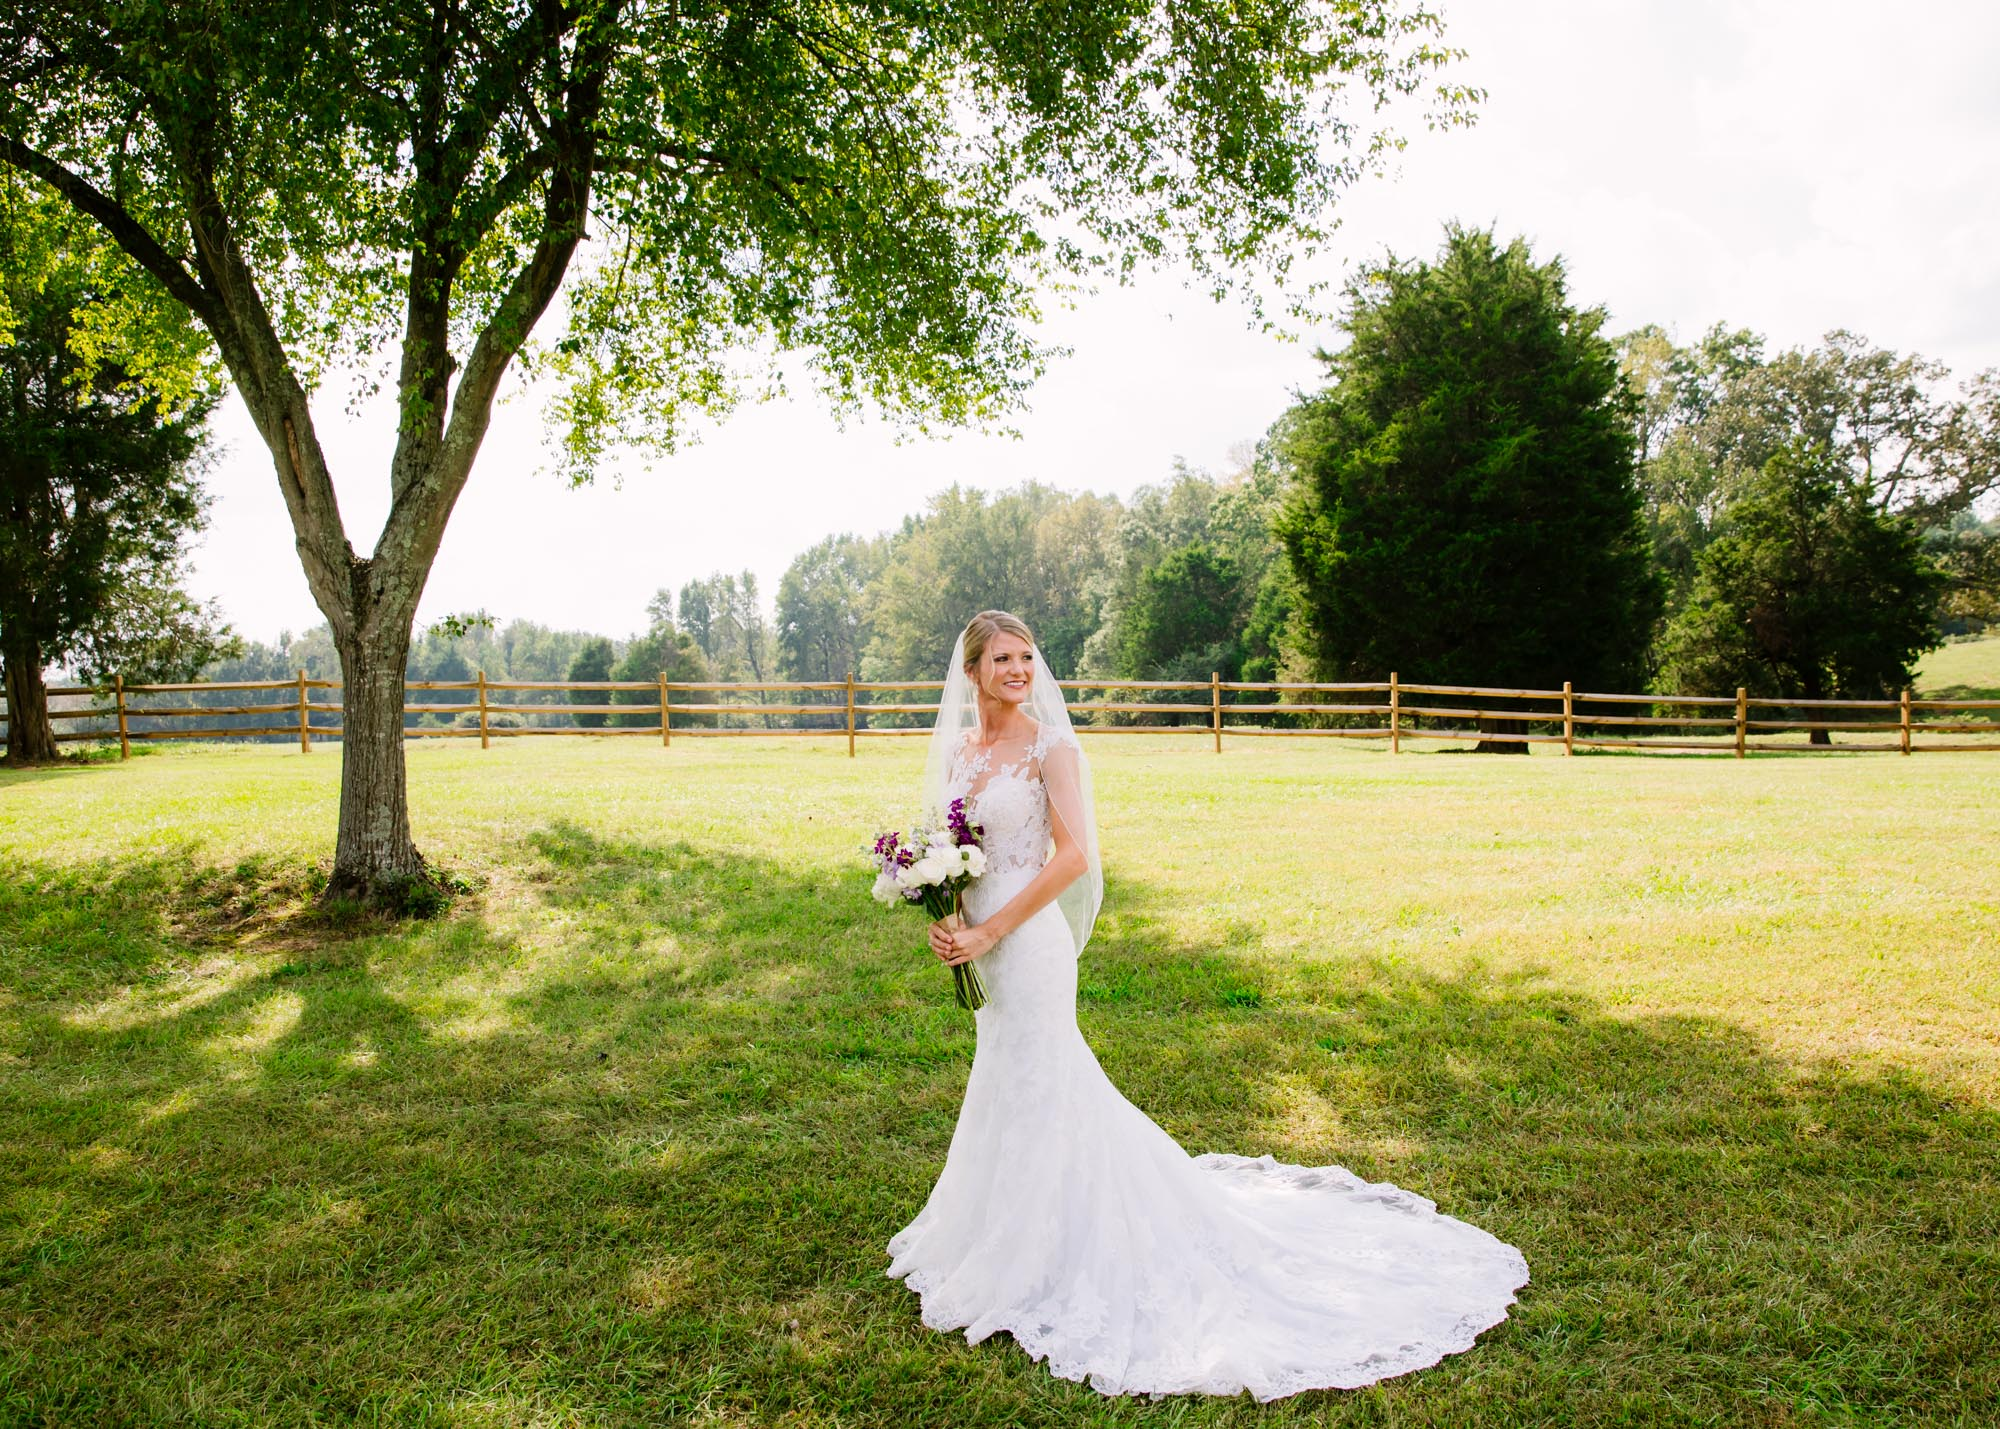 Waynesville, NC Wedding Photography | Bride Solo Portrait